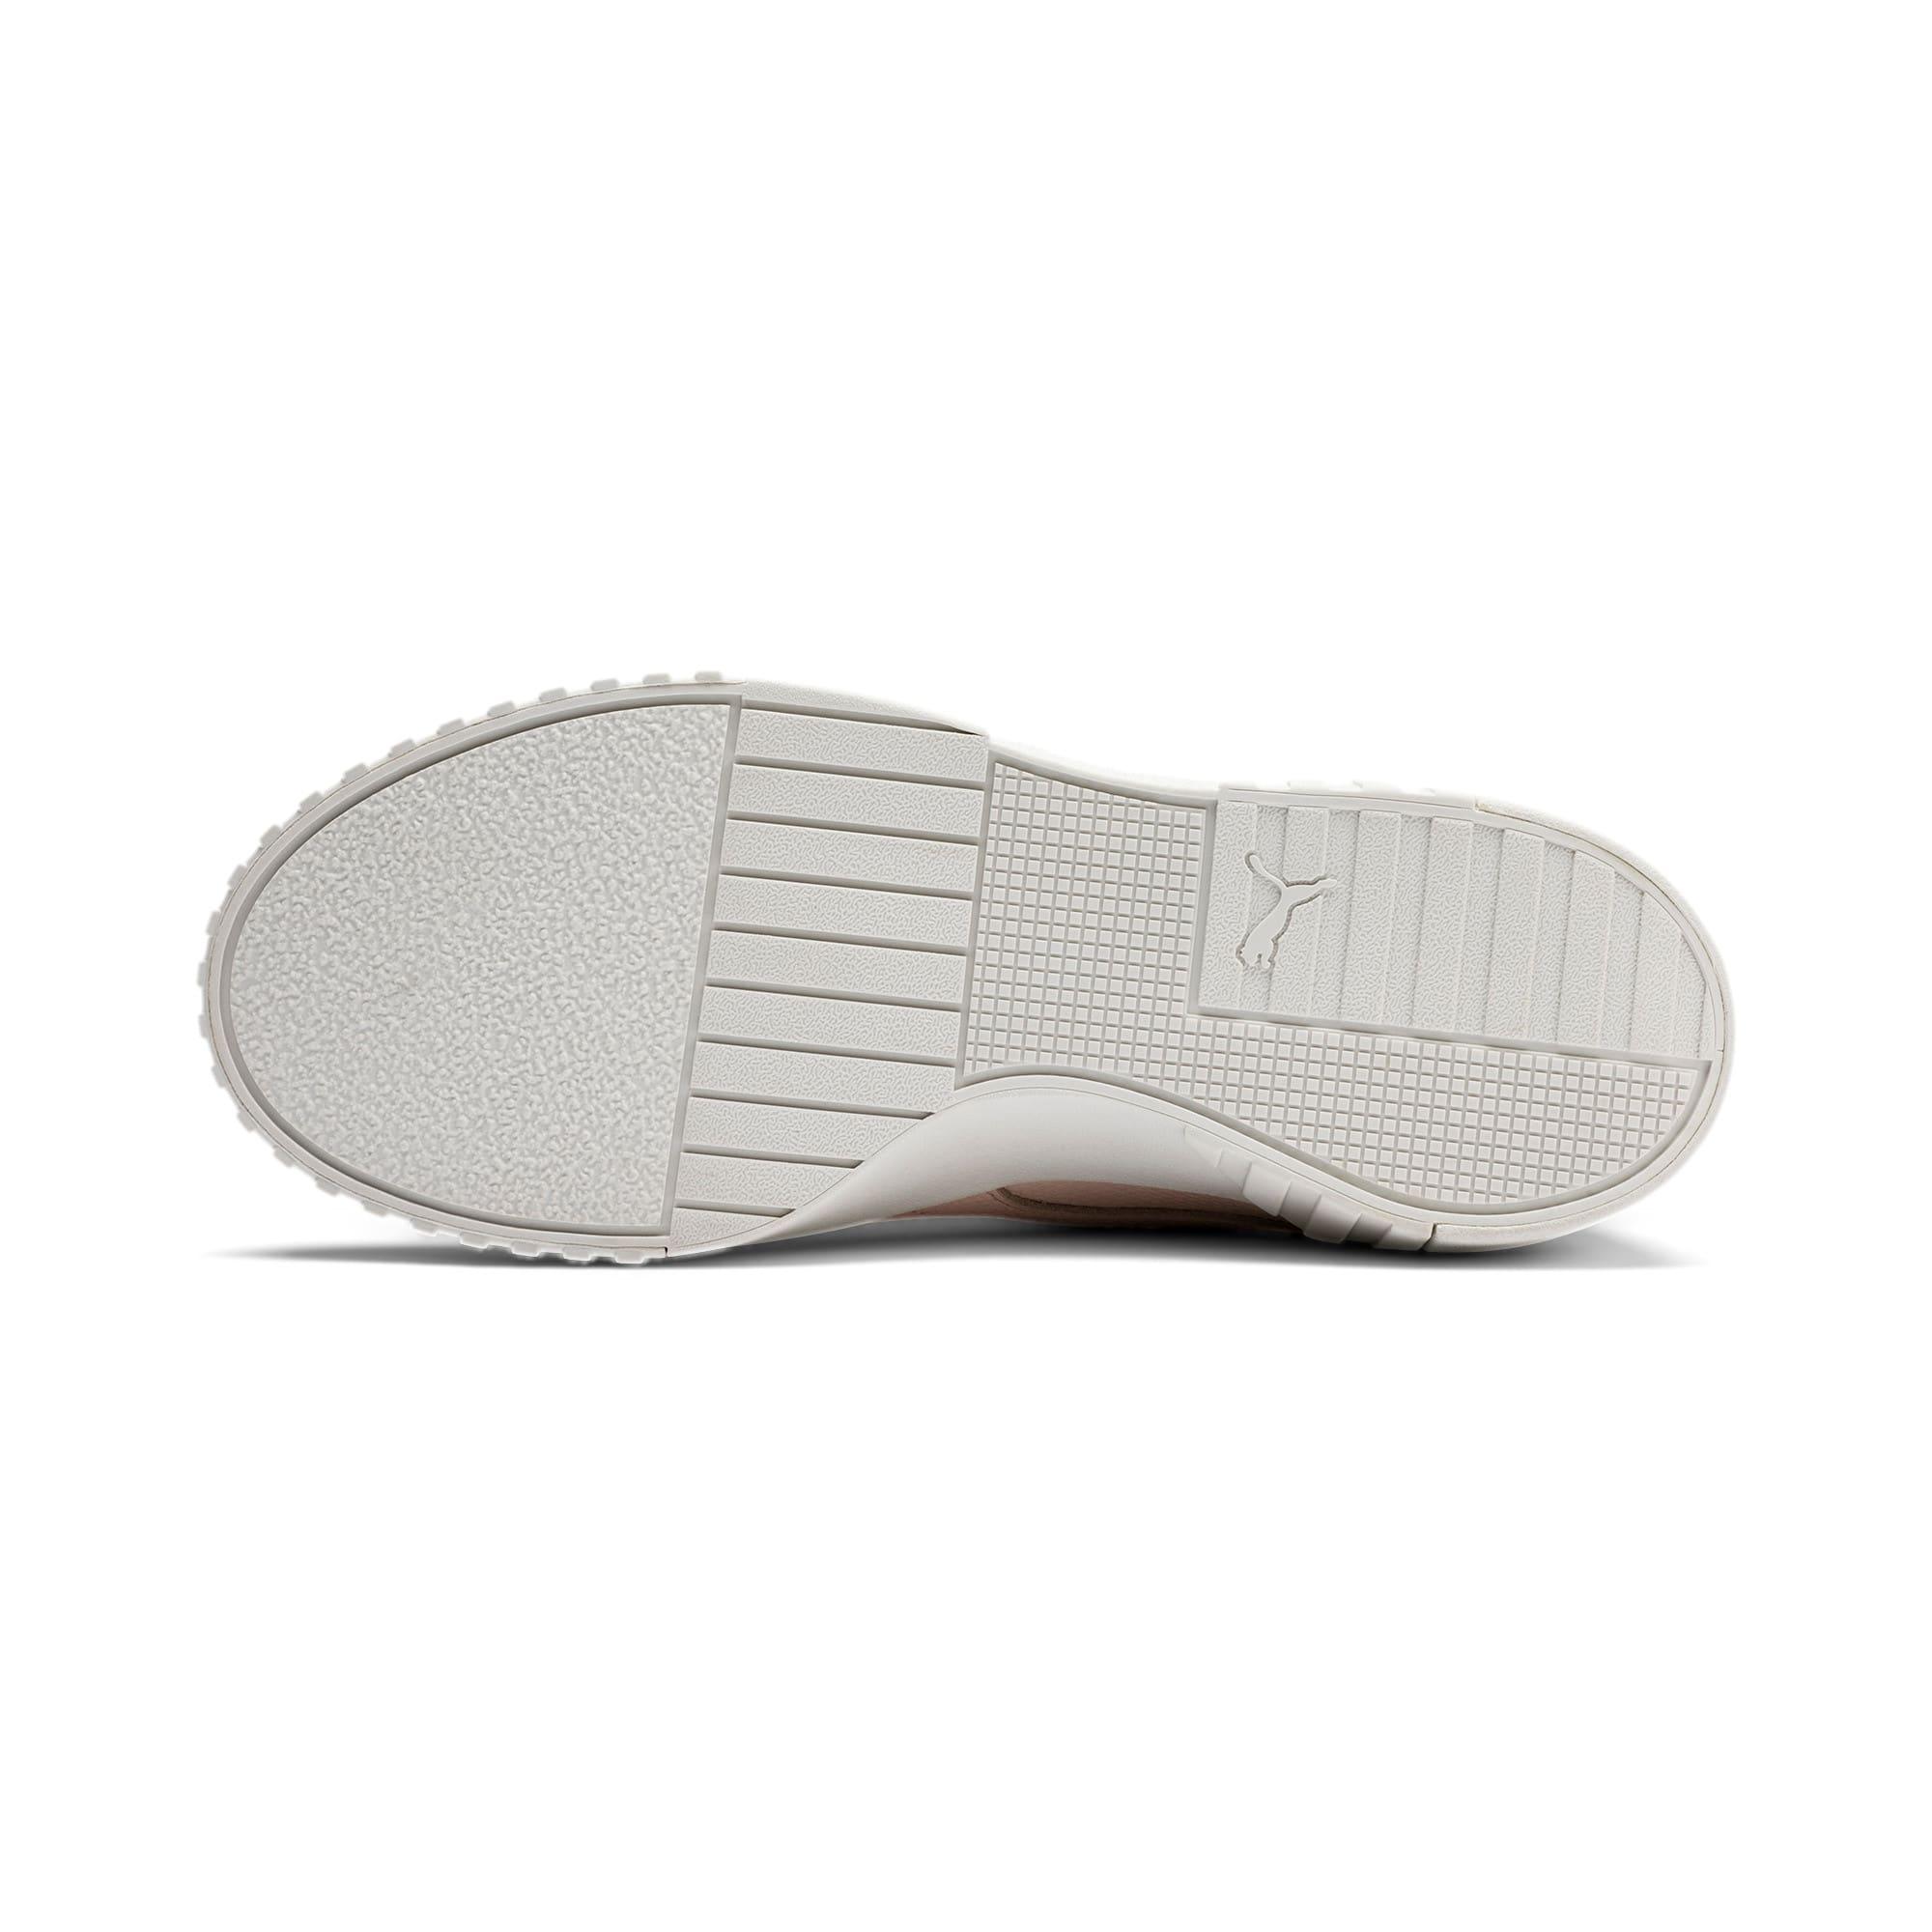 Thumbnail 5 of Cali Emboss Women's Sneakers, Cream Tan-Cream Tan, medium